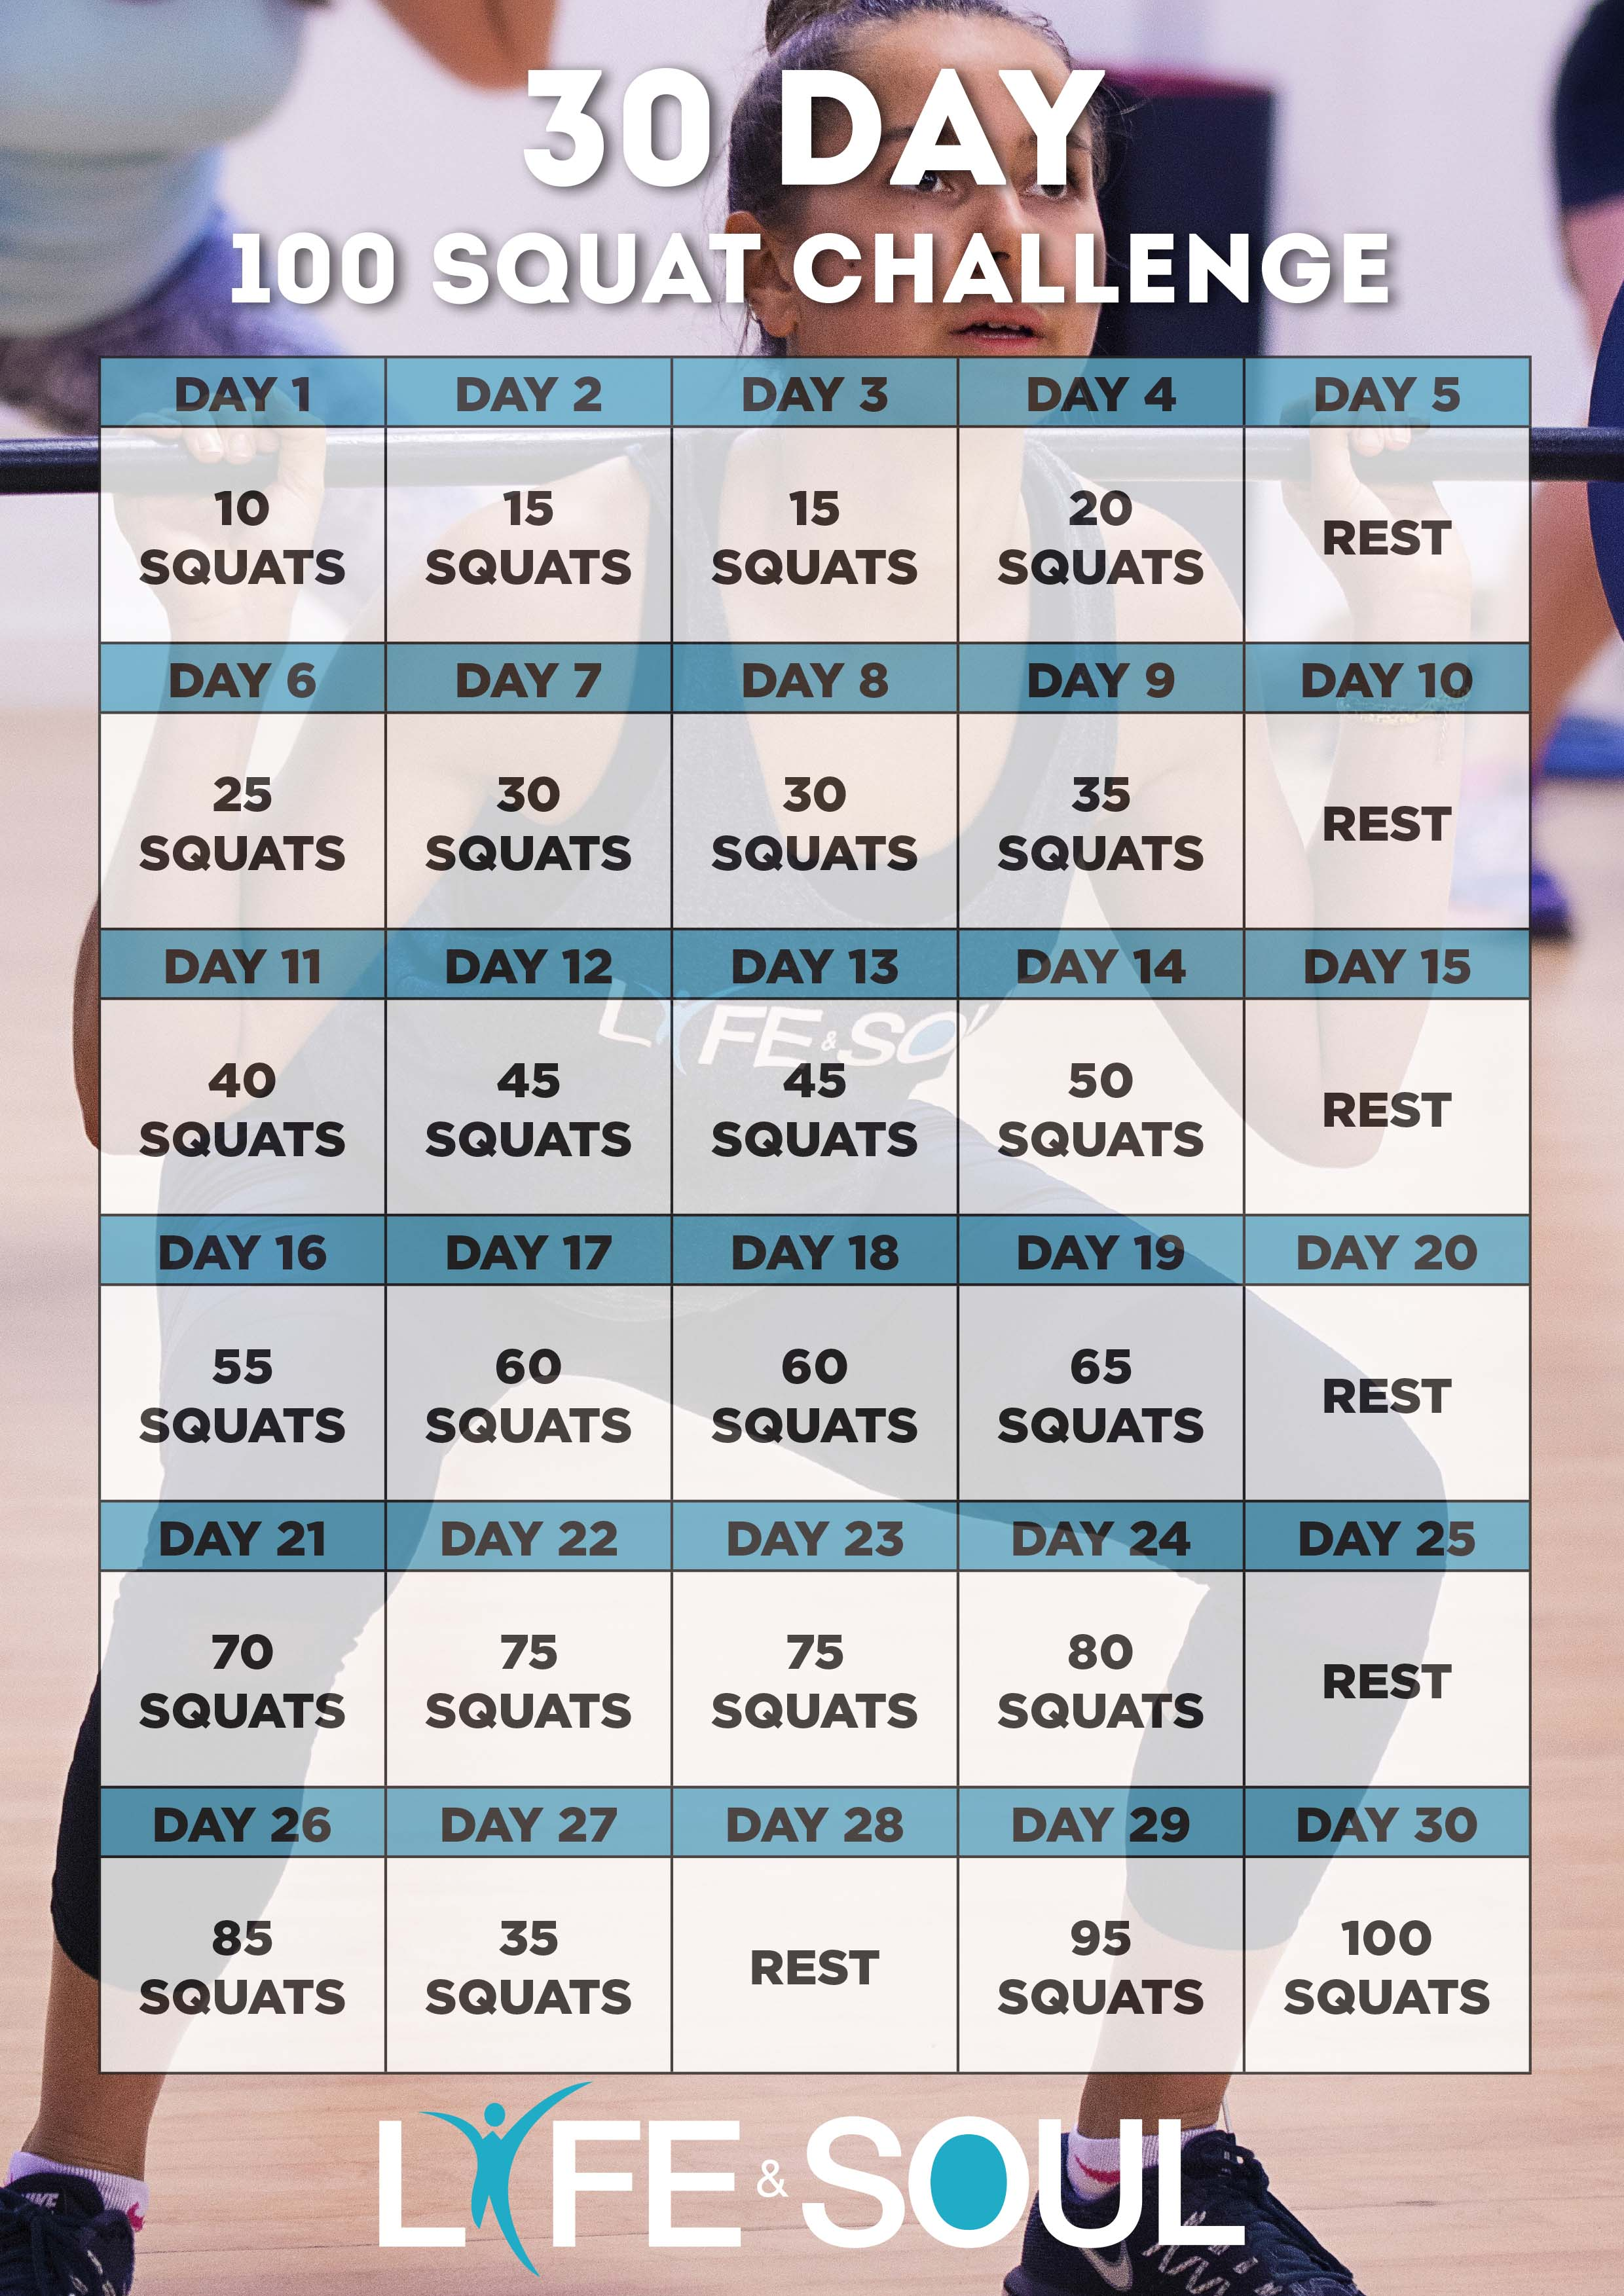 30 Day Squat Challenge - Life & Soul